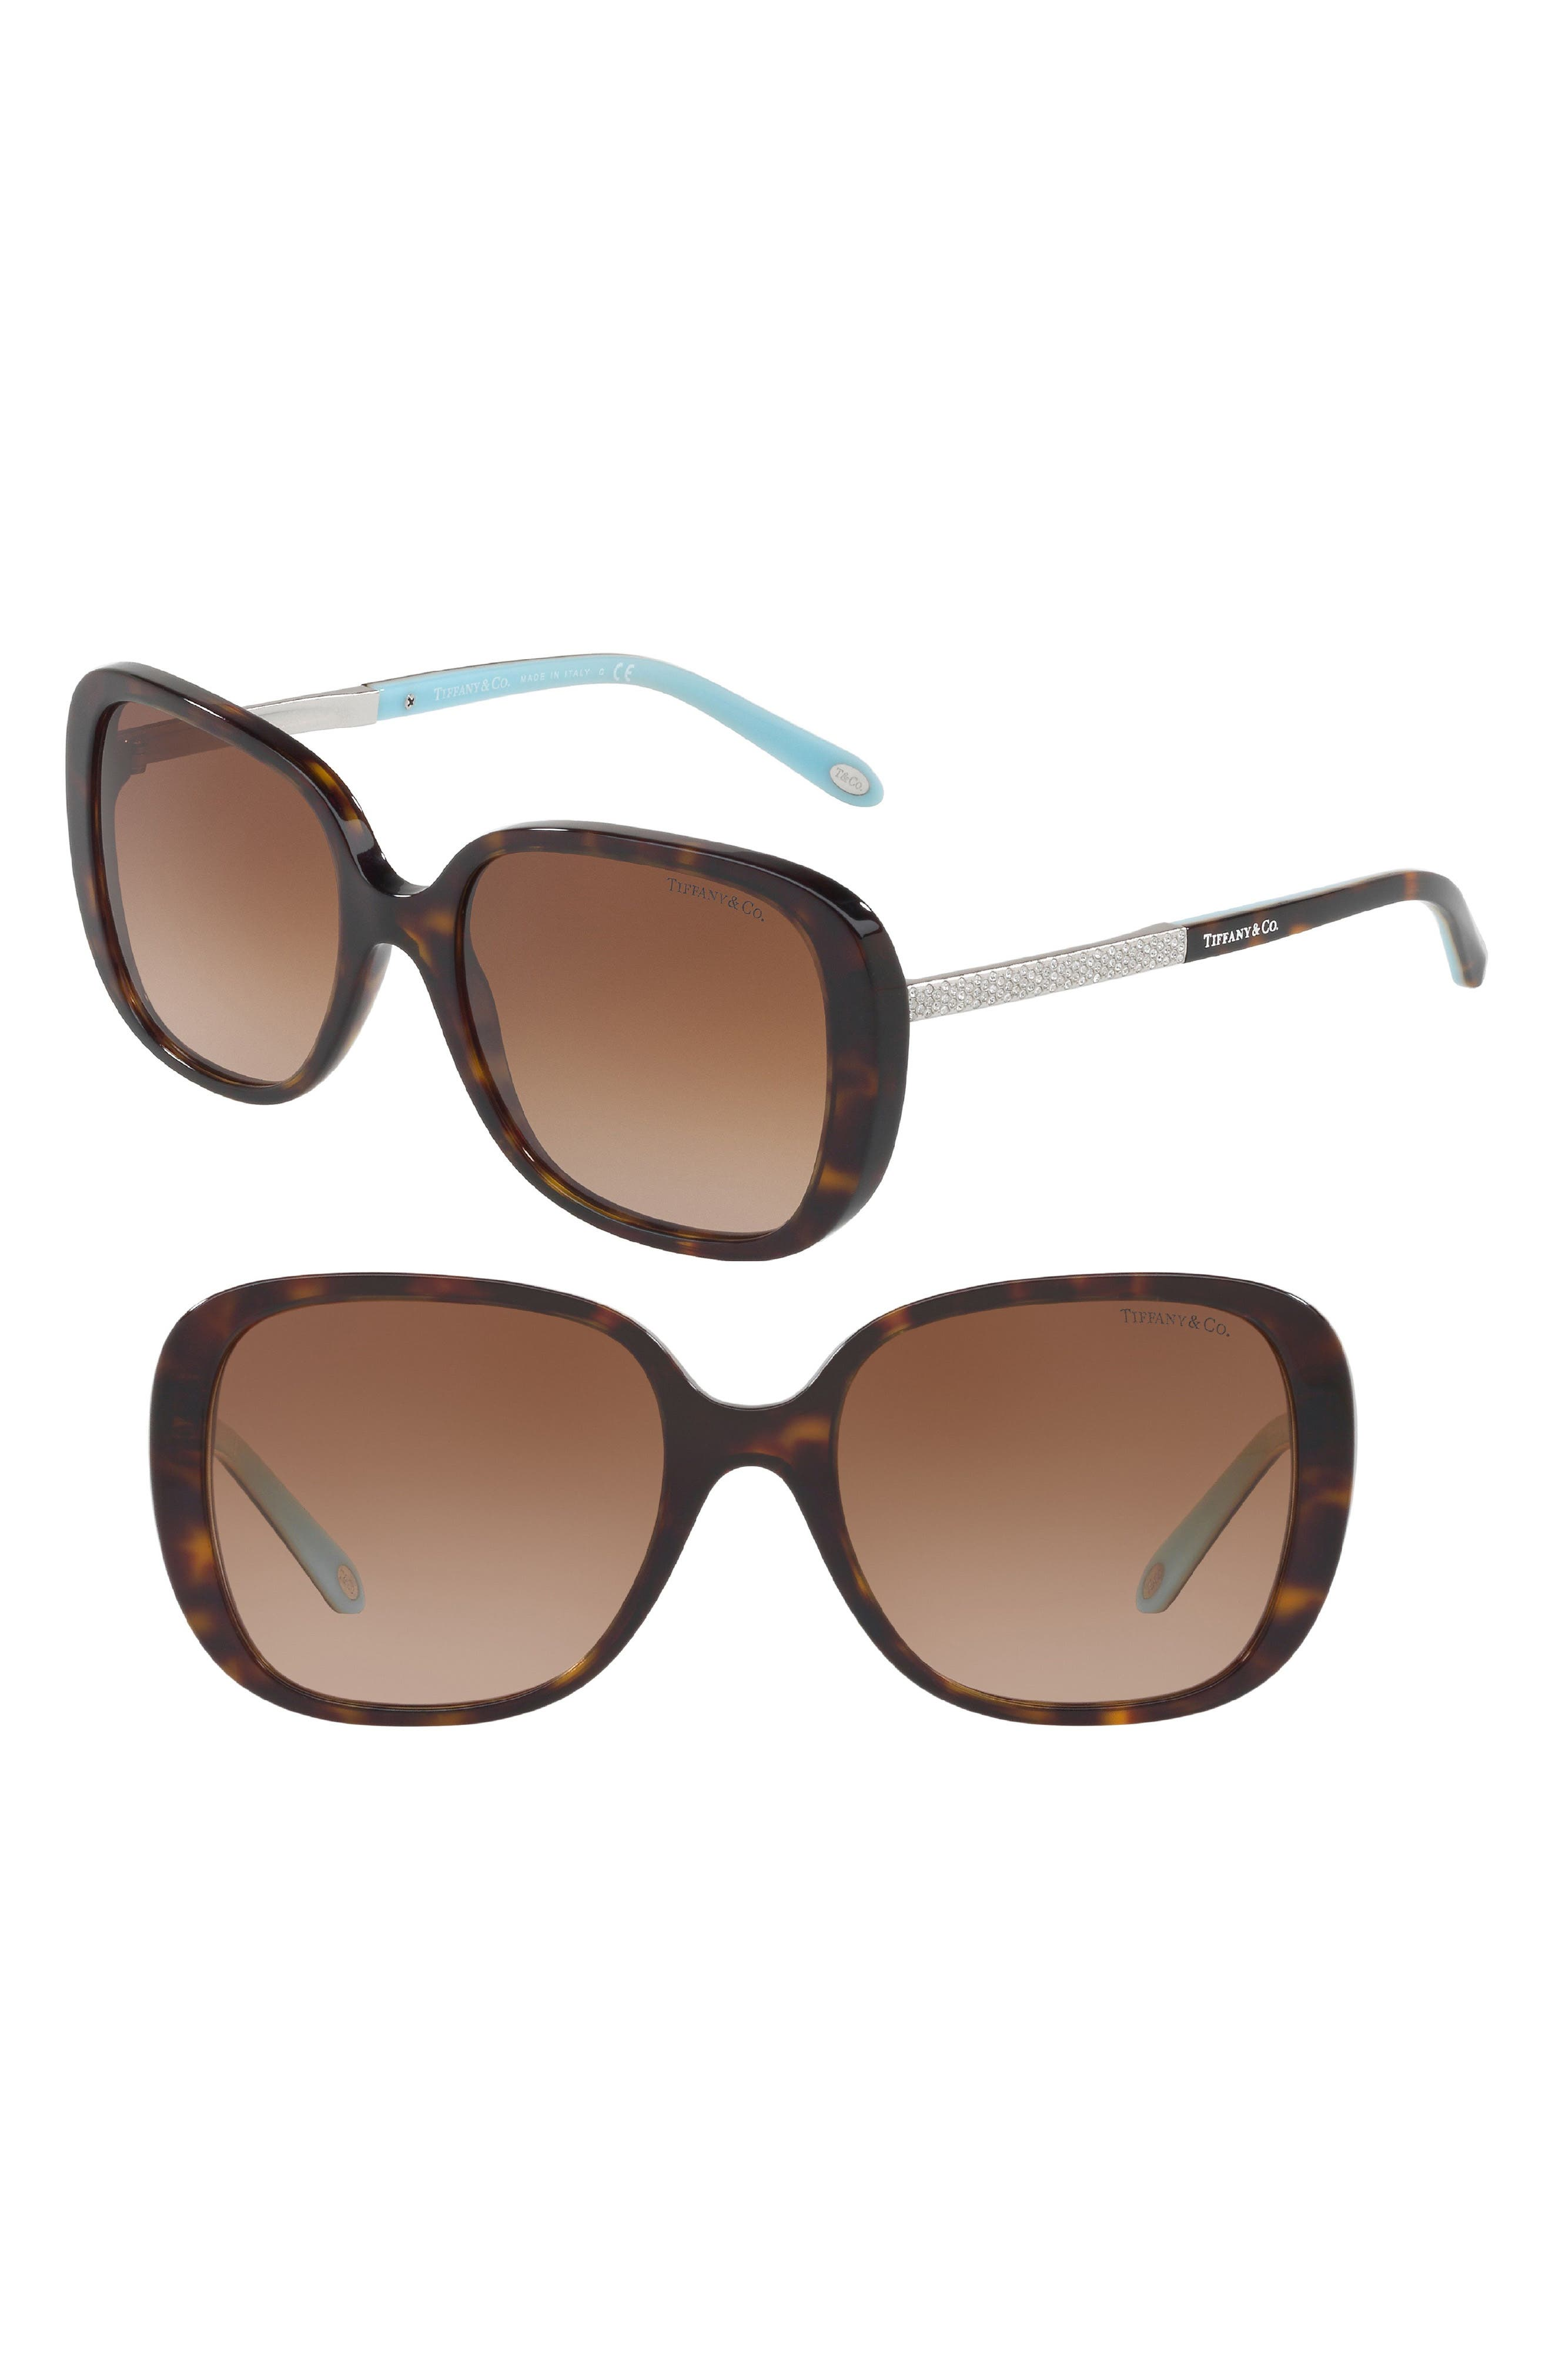 54mm Gradient Sunglasses,                         Main,                         color, Dark Havana